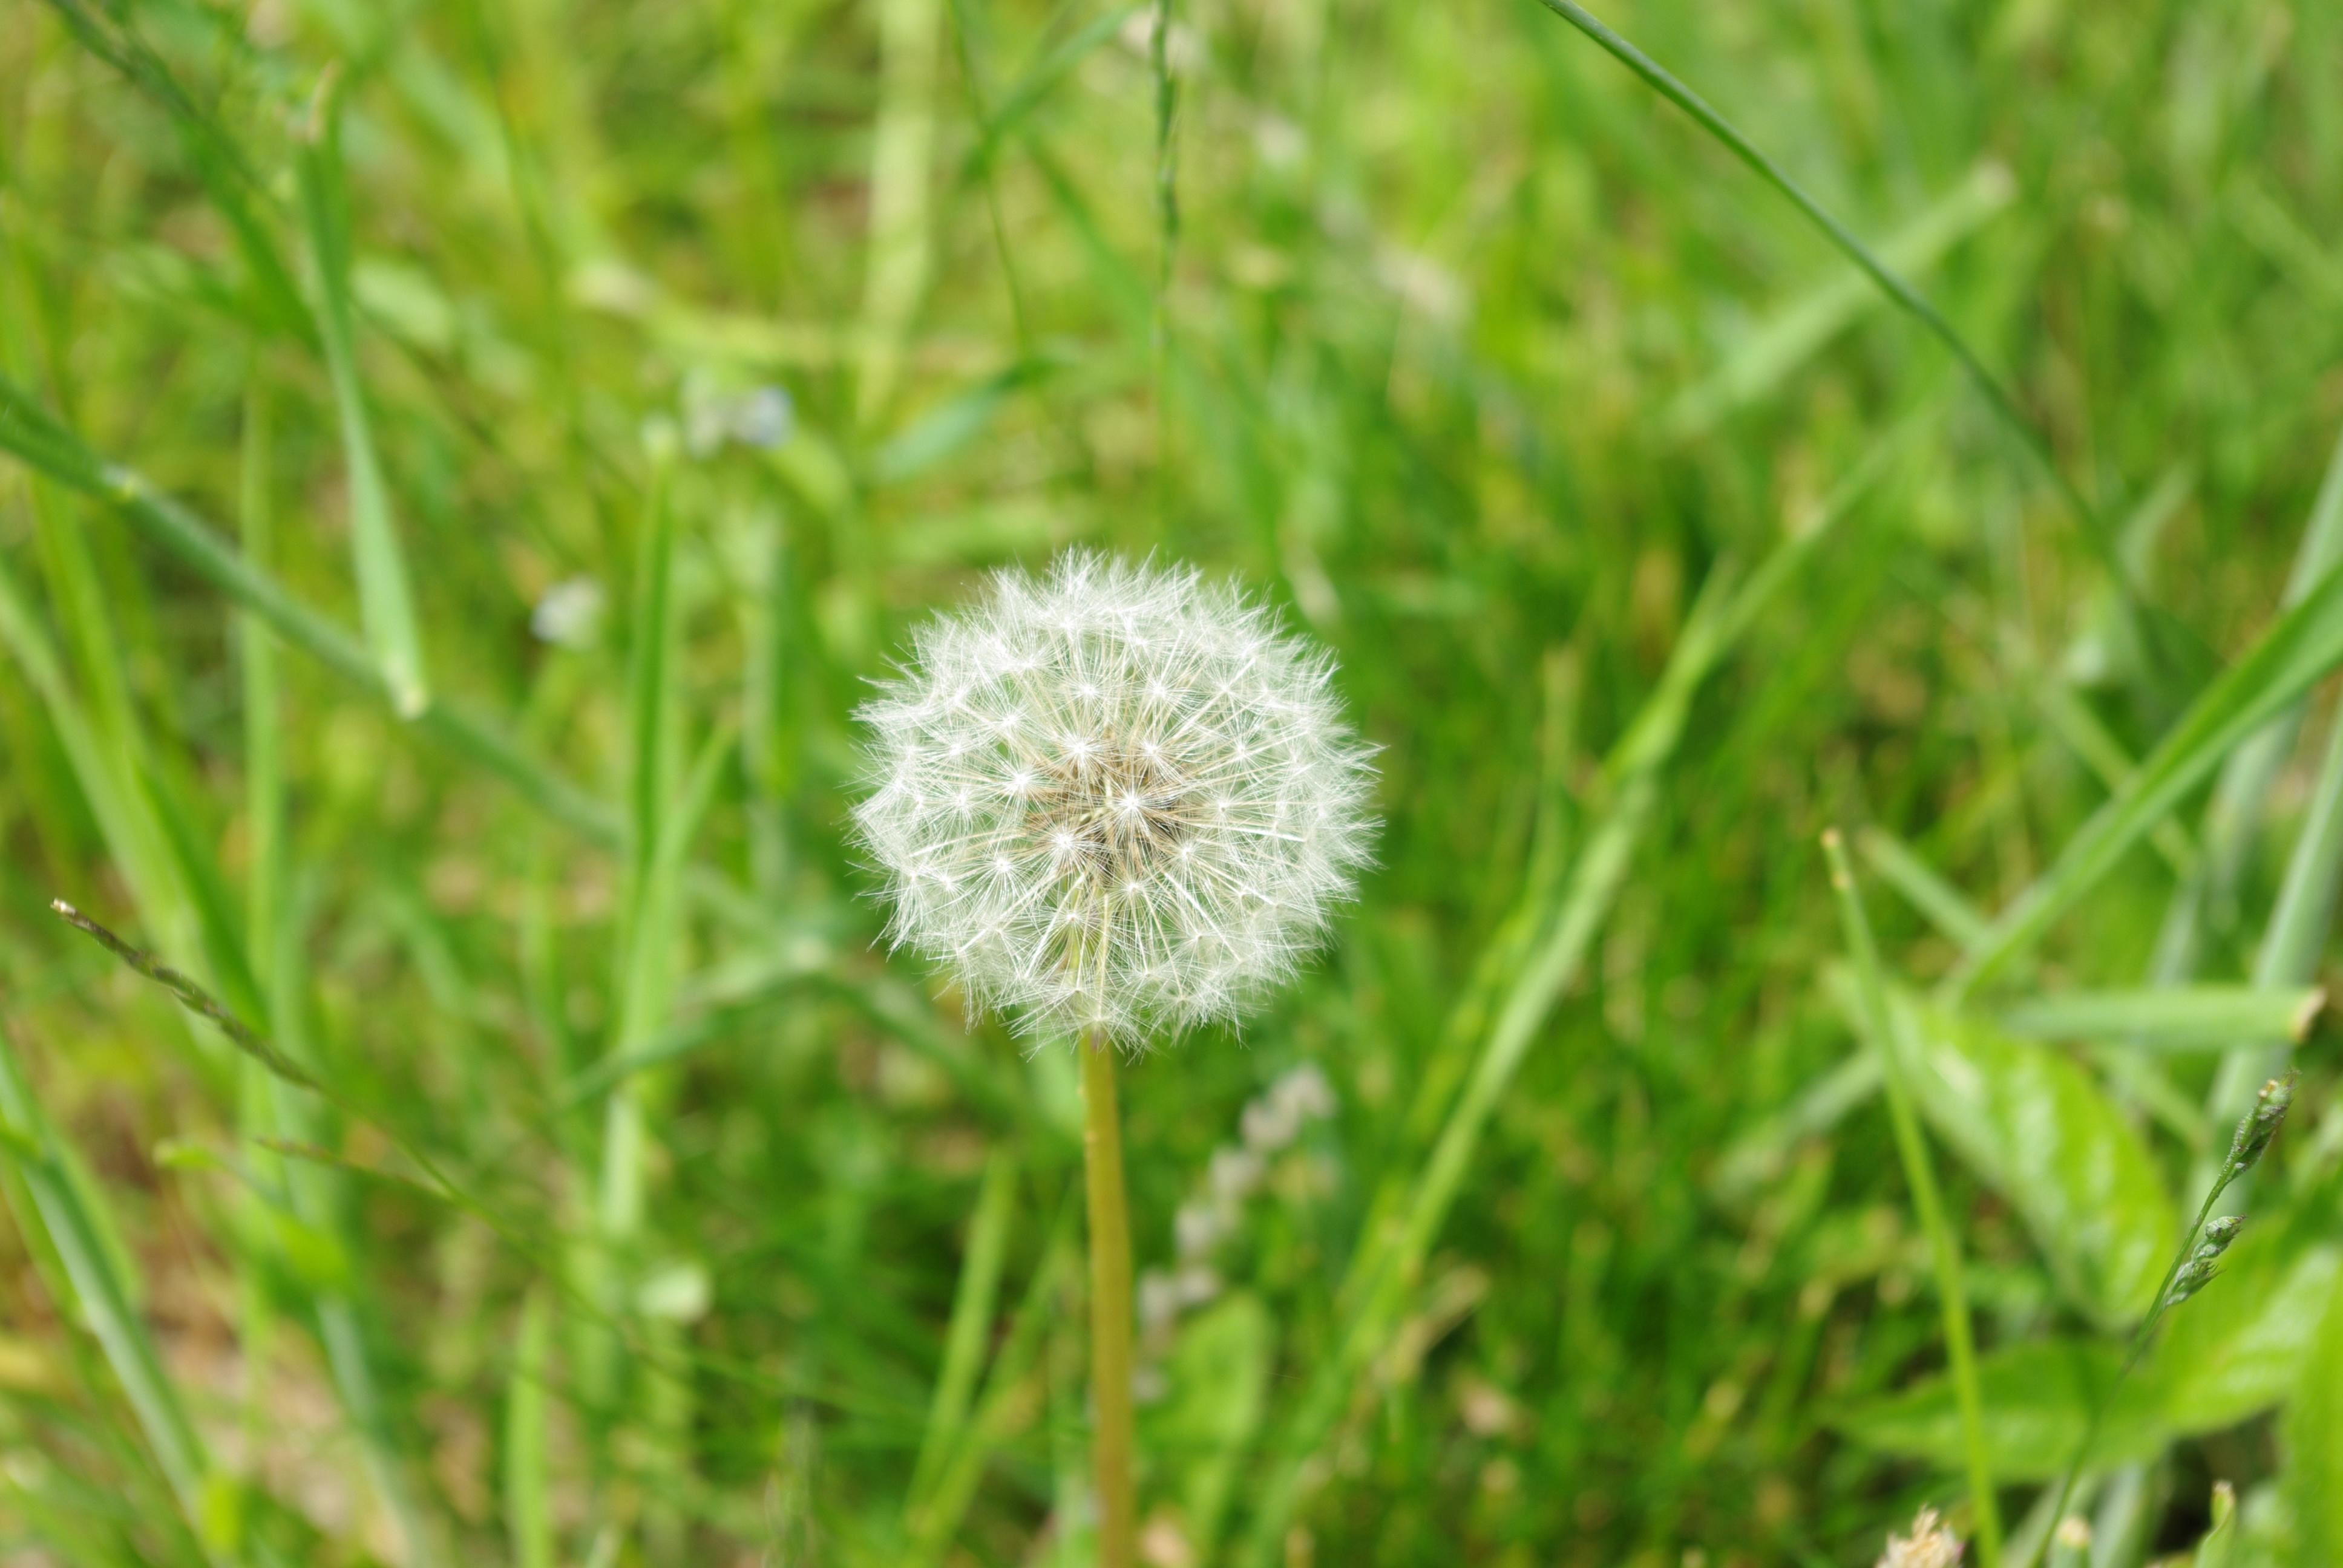 White Dandelion Hd